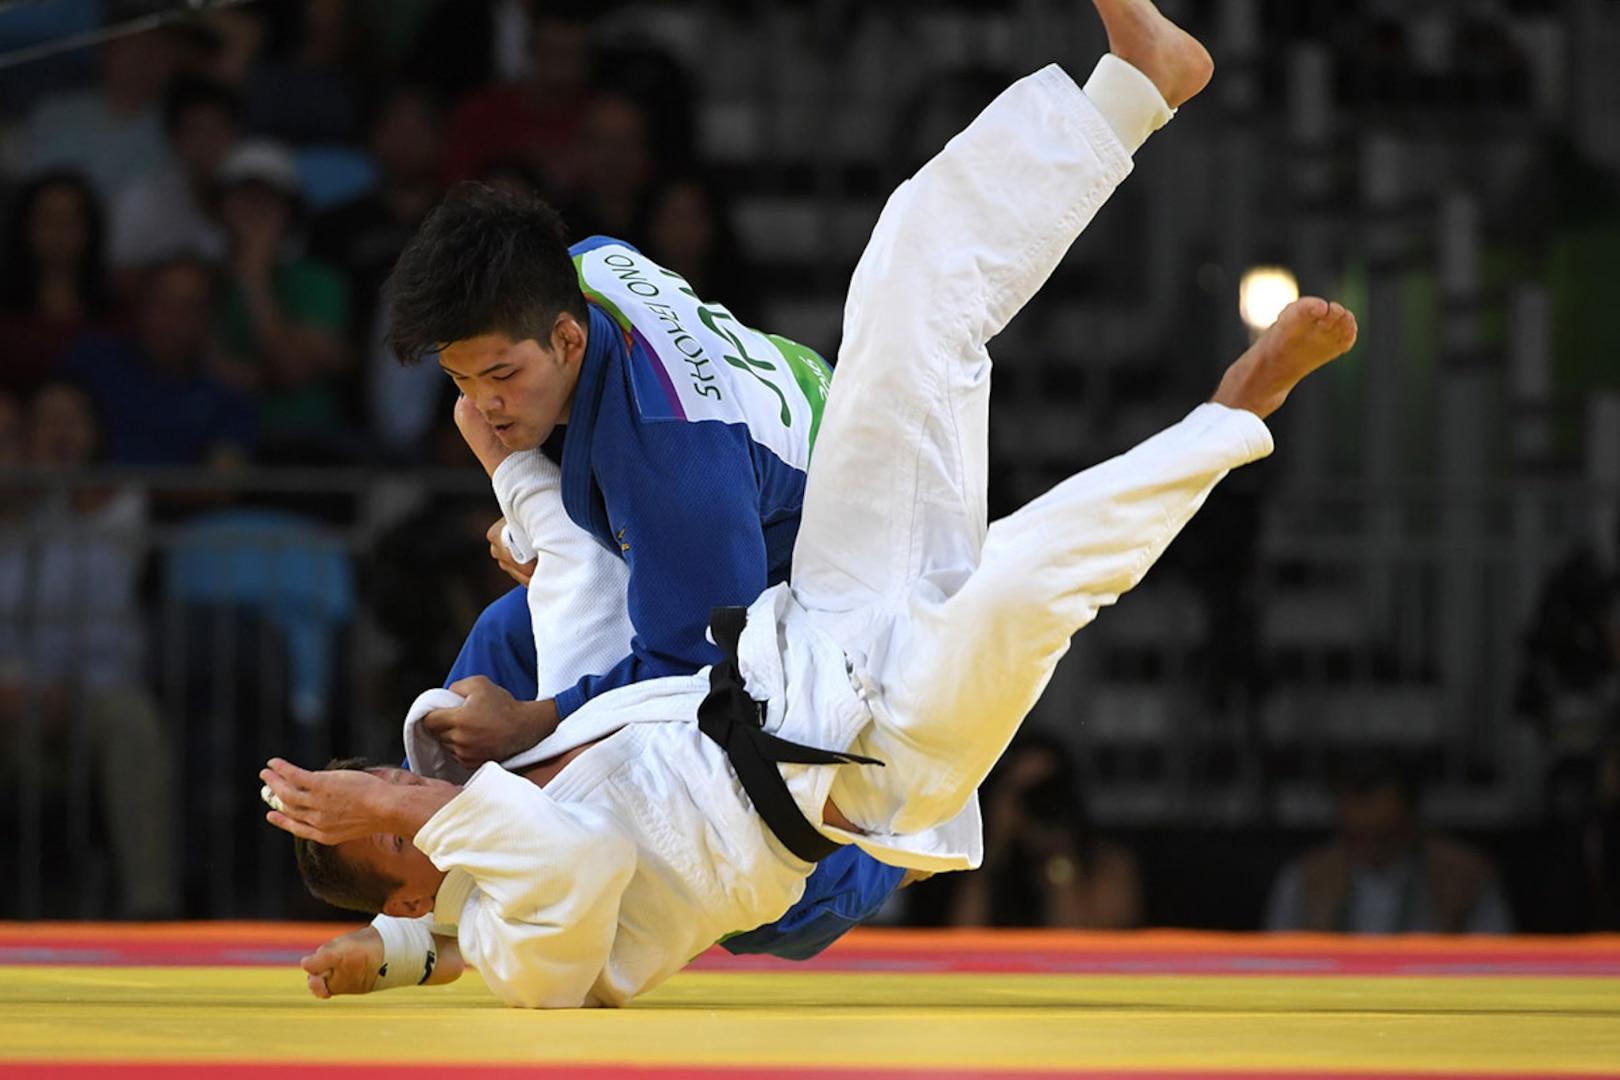 Shohei Ono sends an opposing judoka to the ground